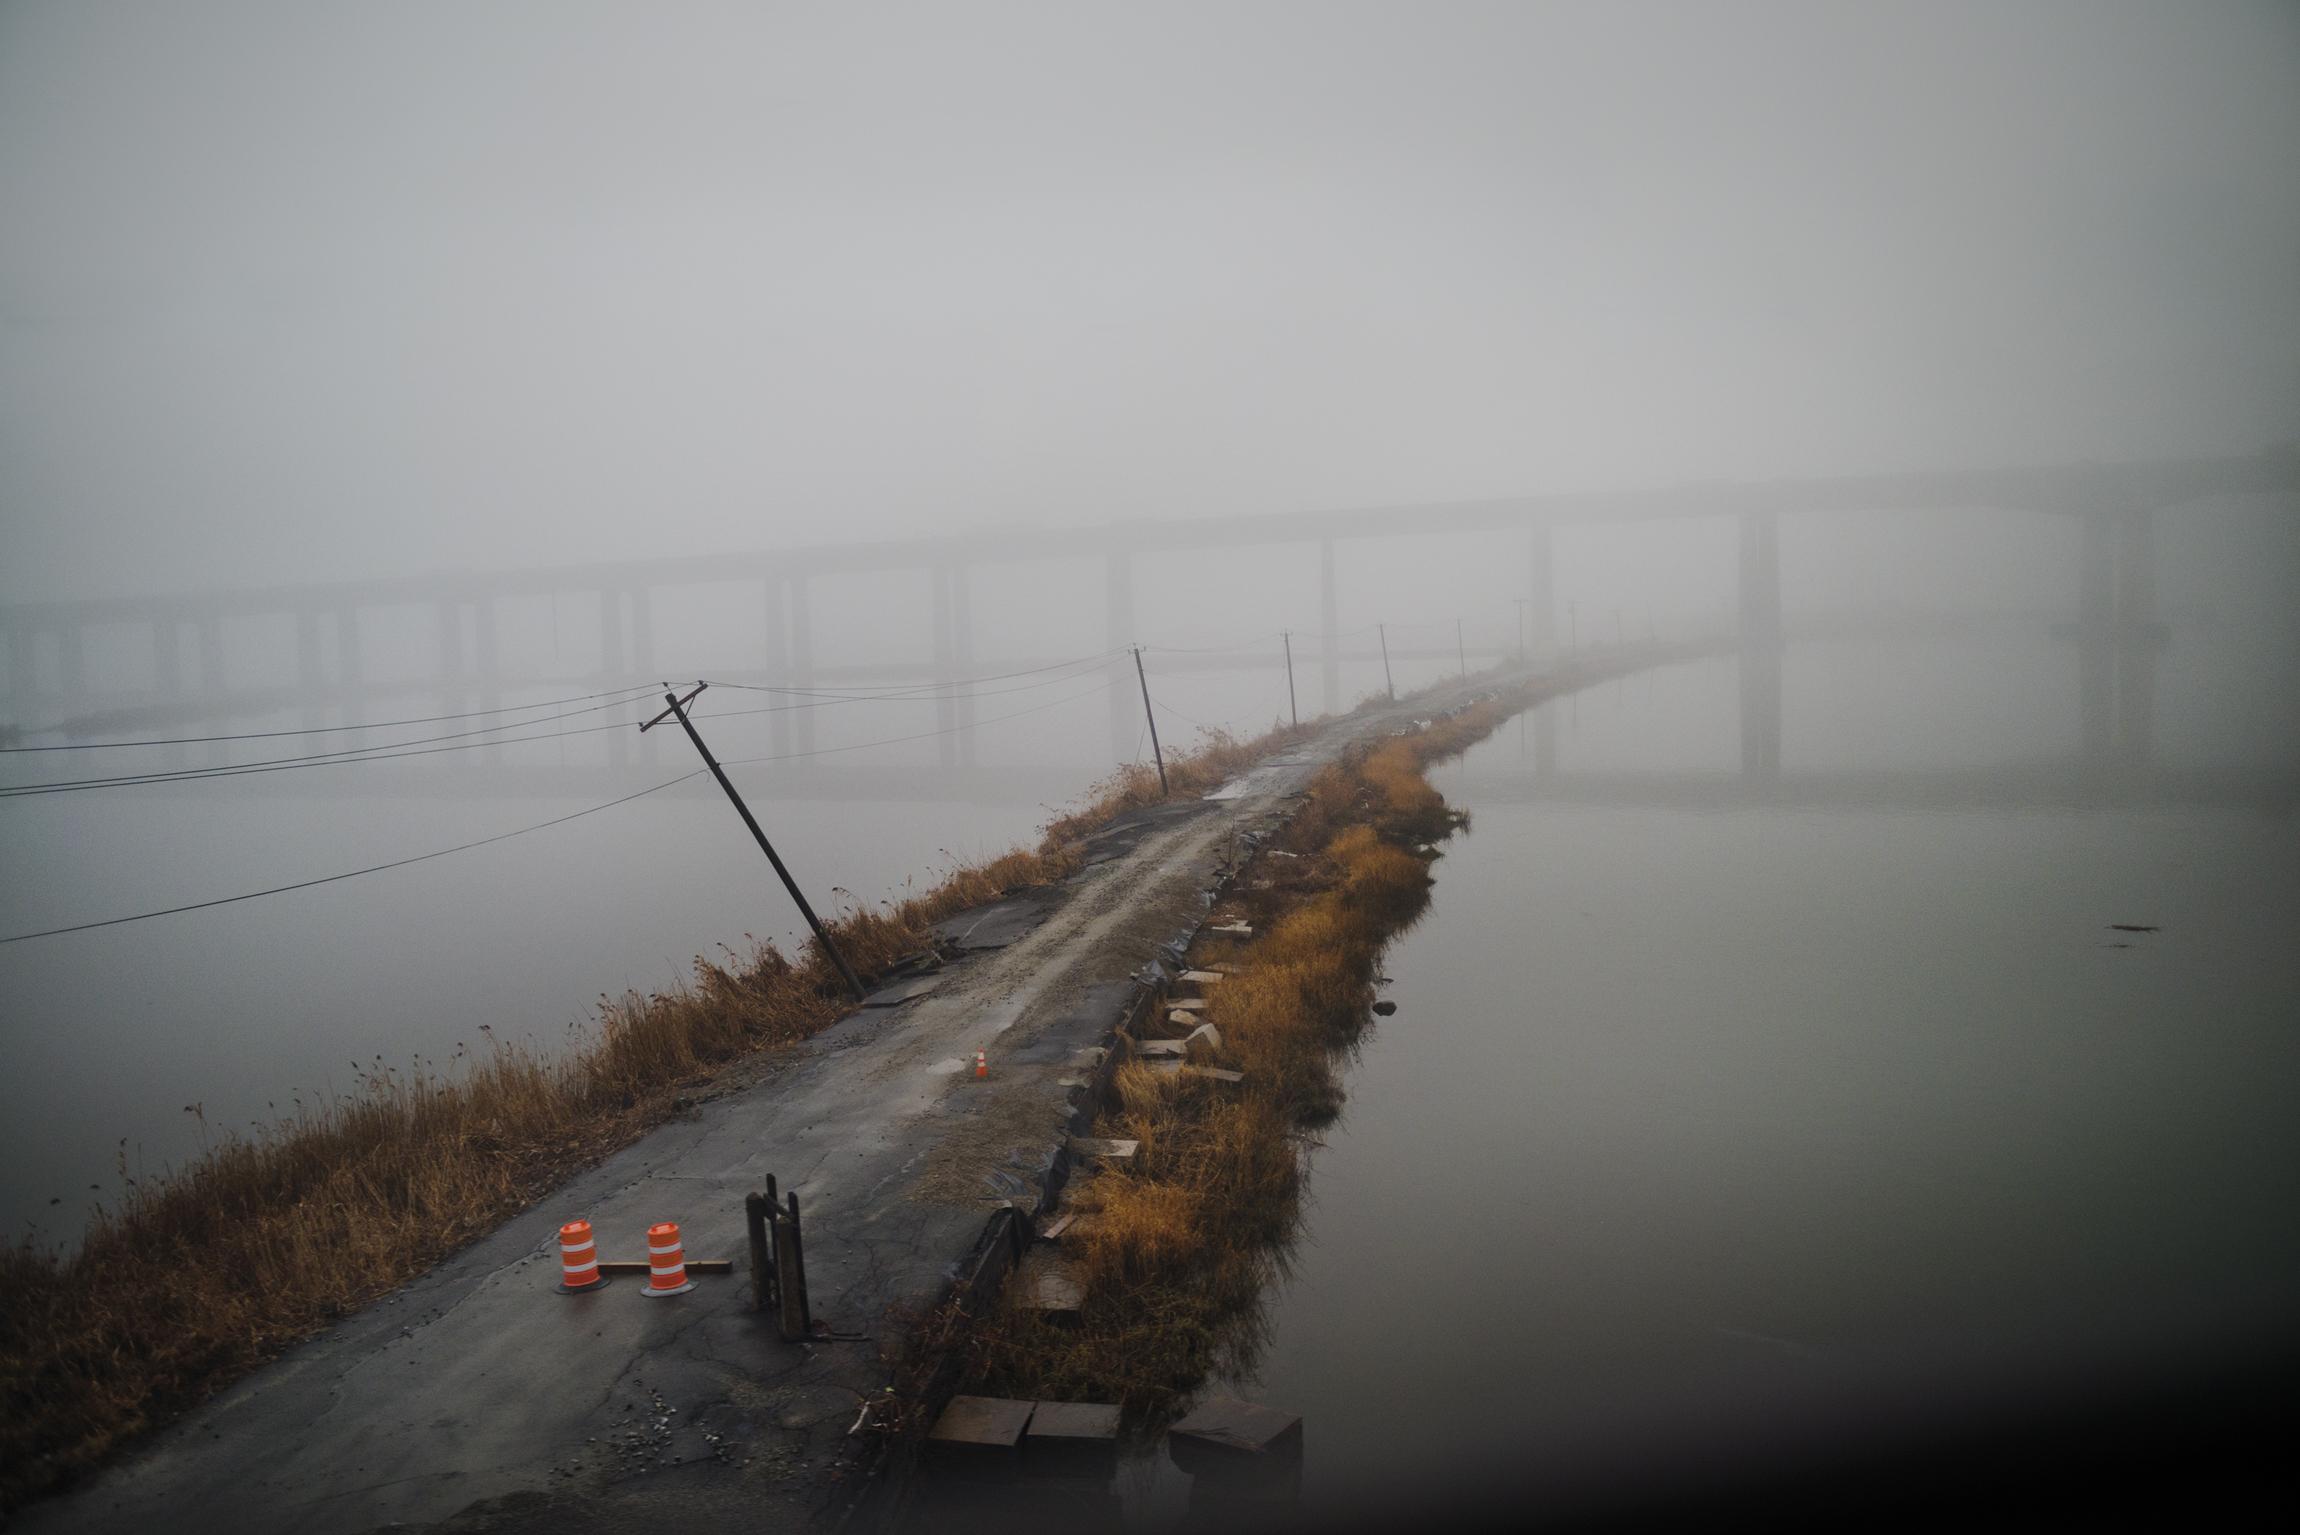 Meadowlands, Secaucus, New Jersey